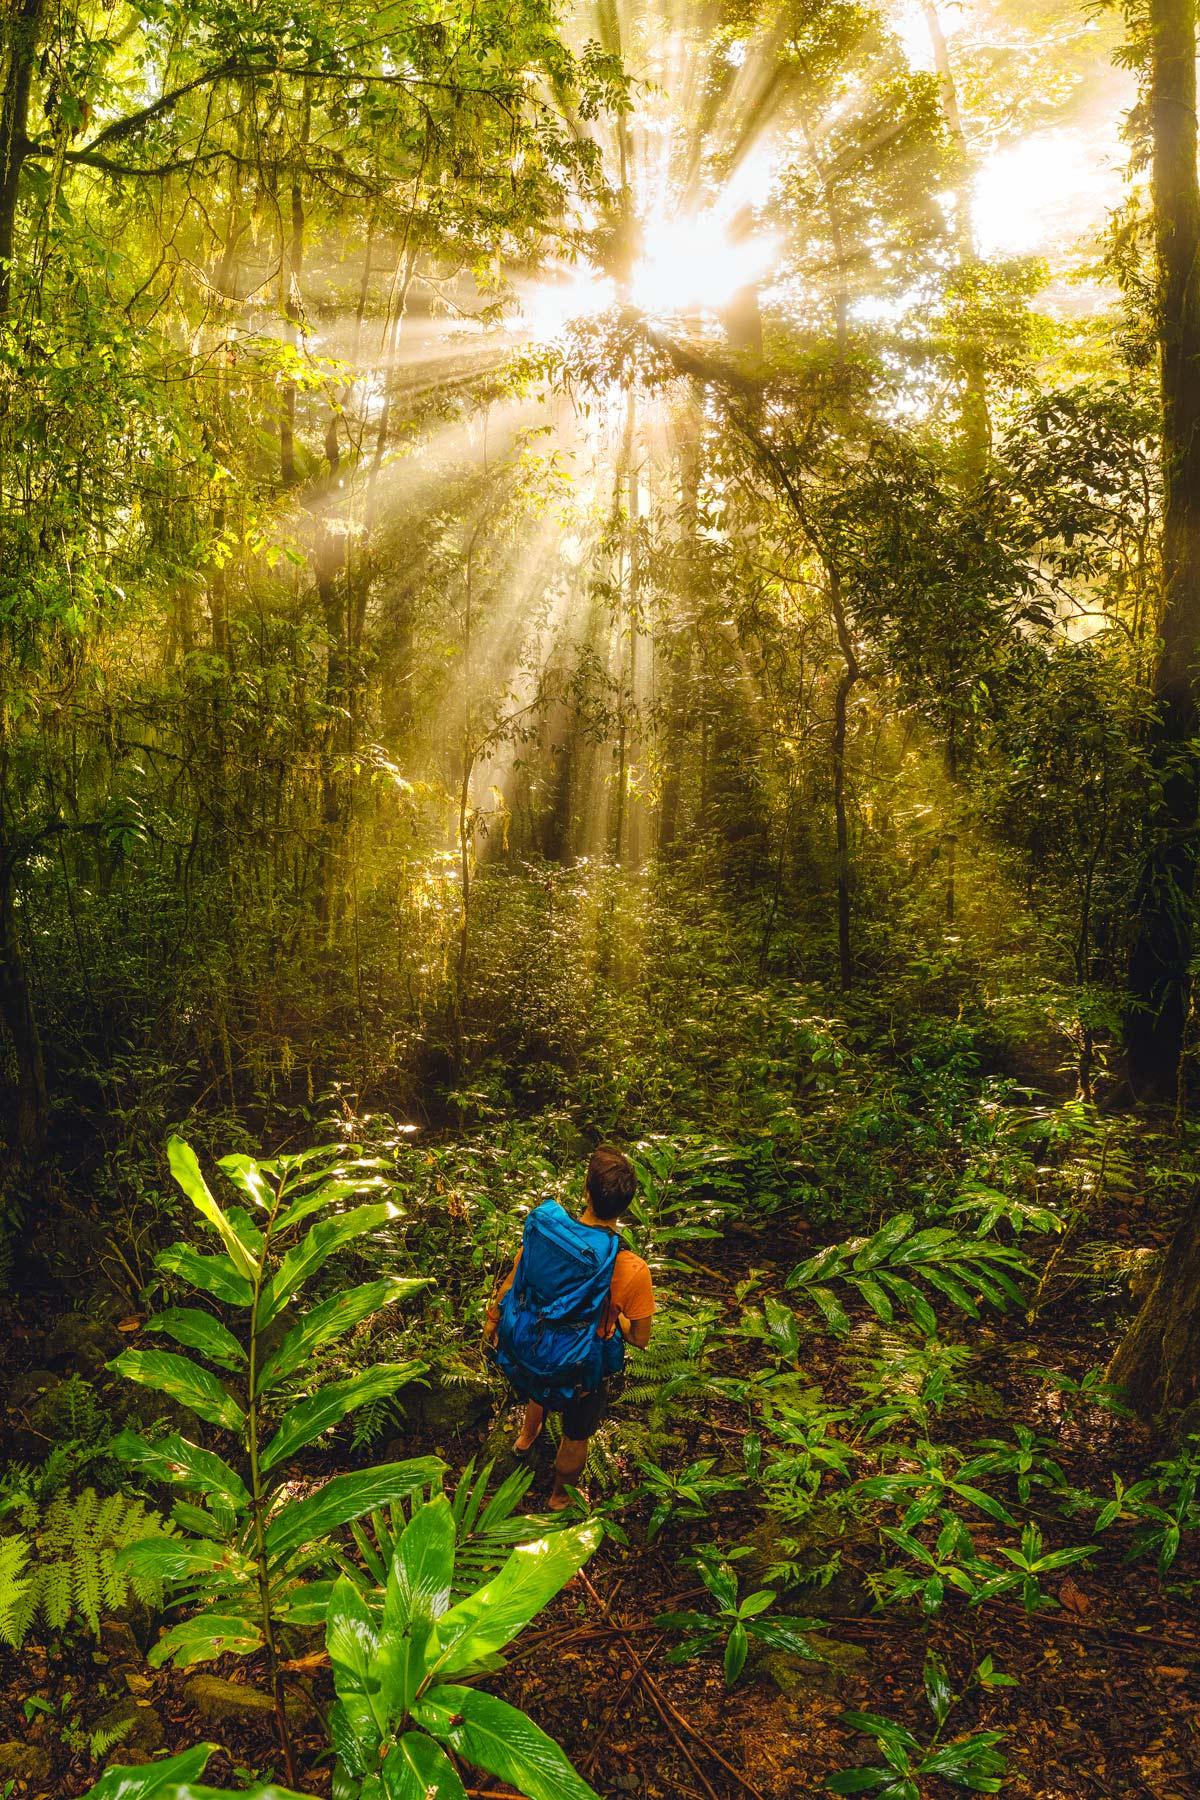 Daintree Rainforest Light Rays